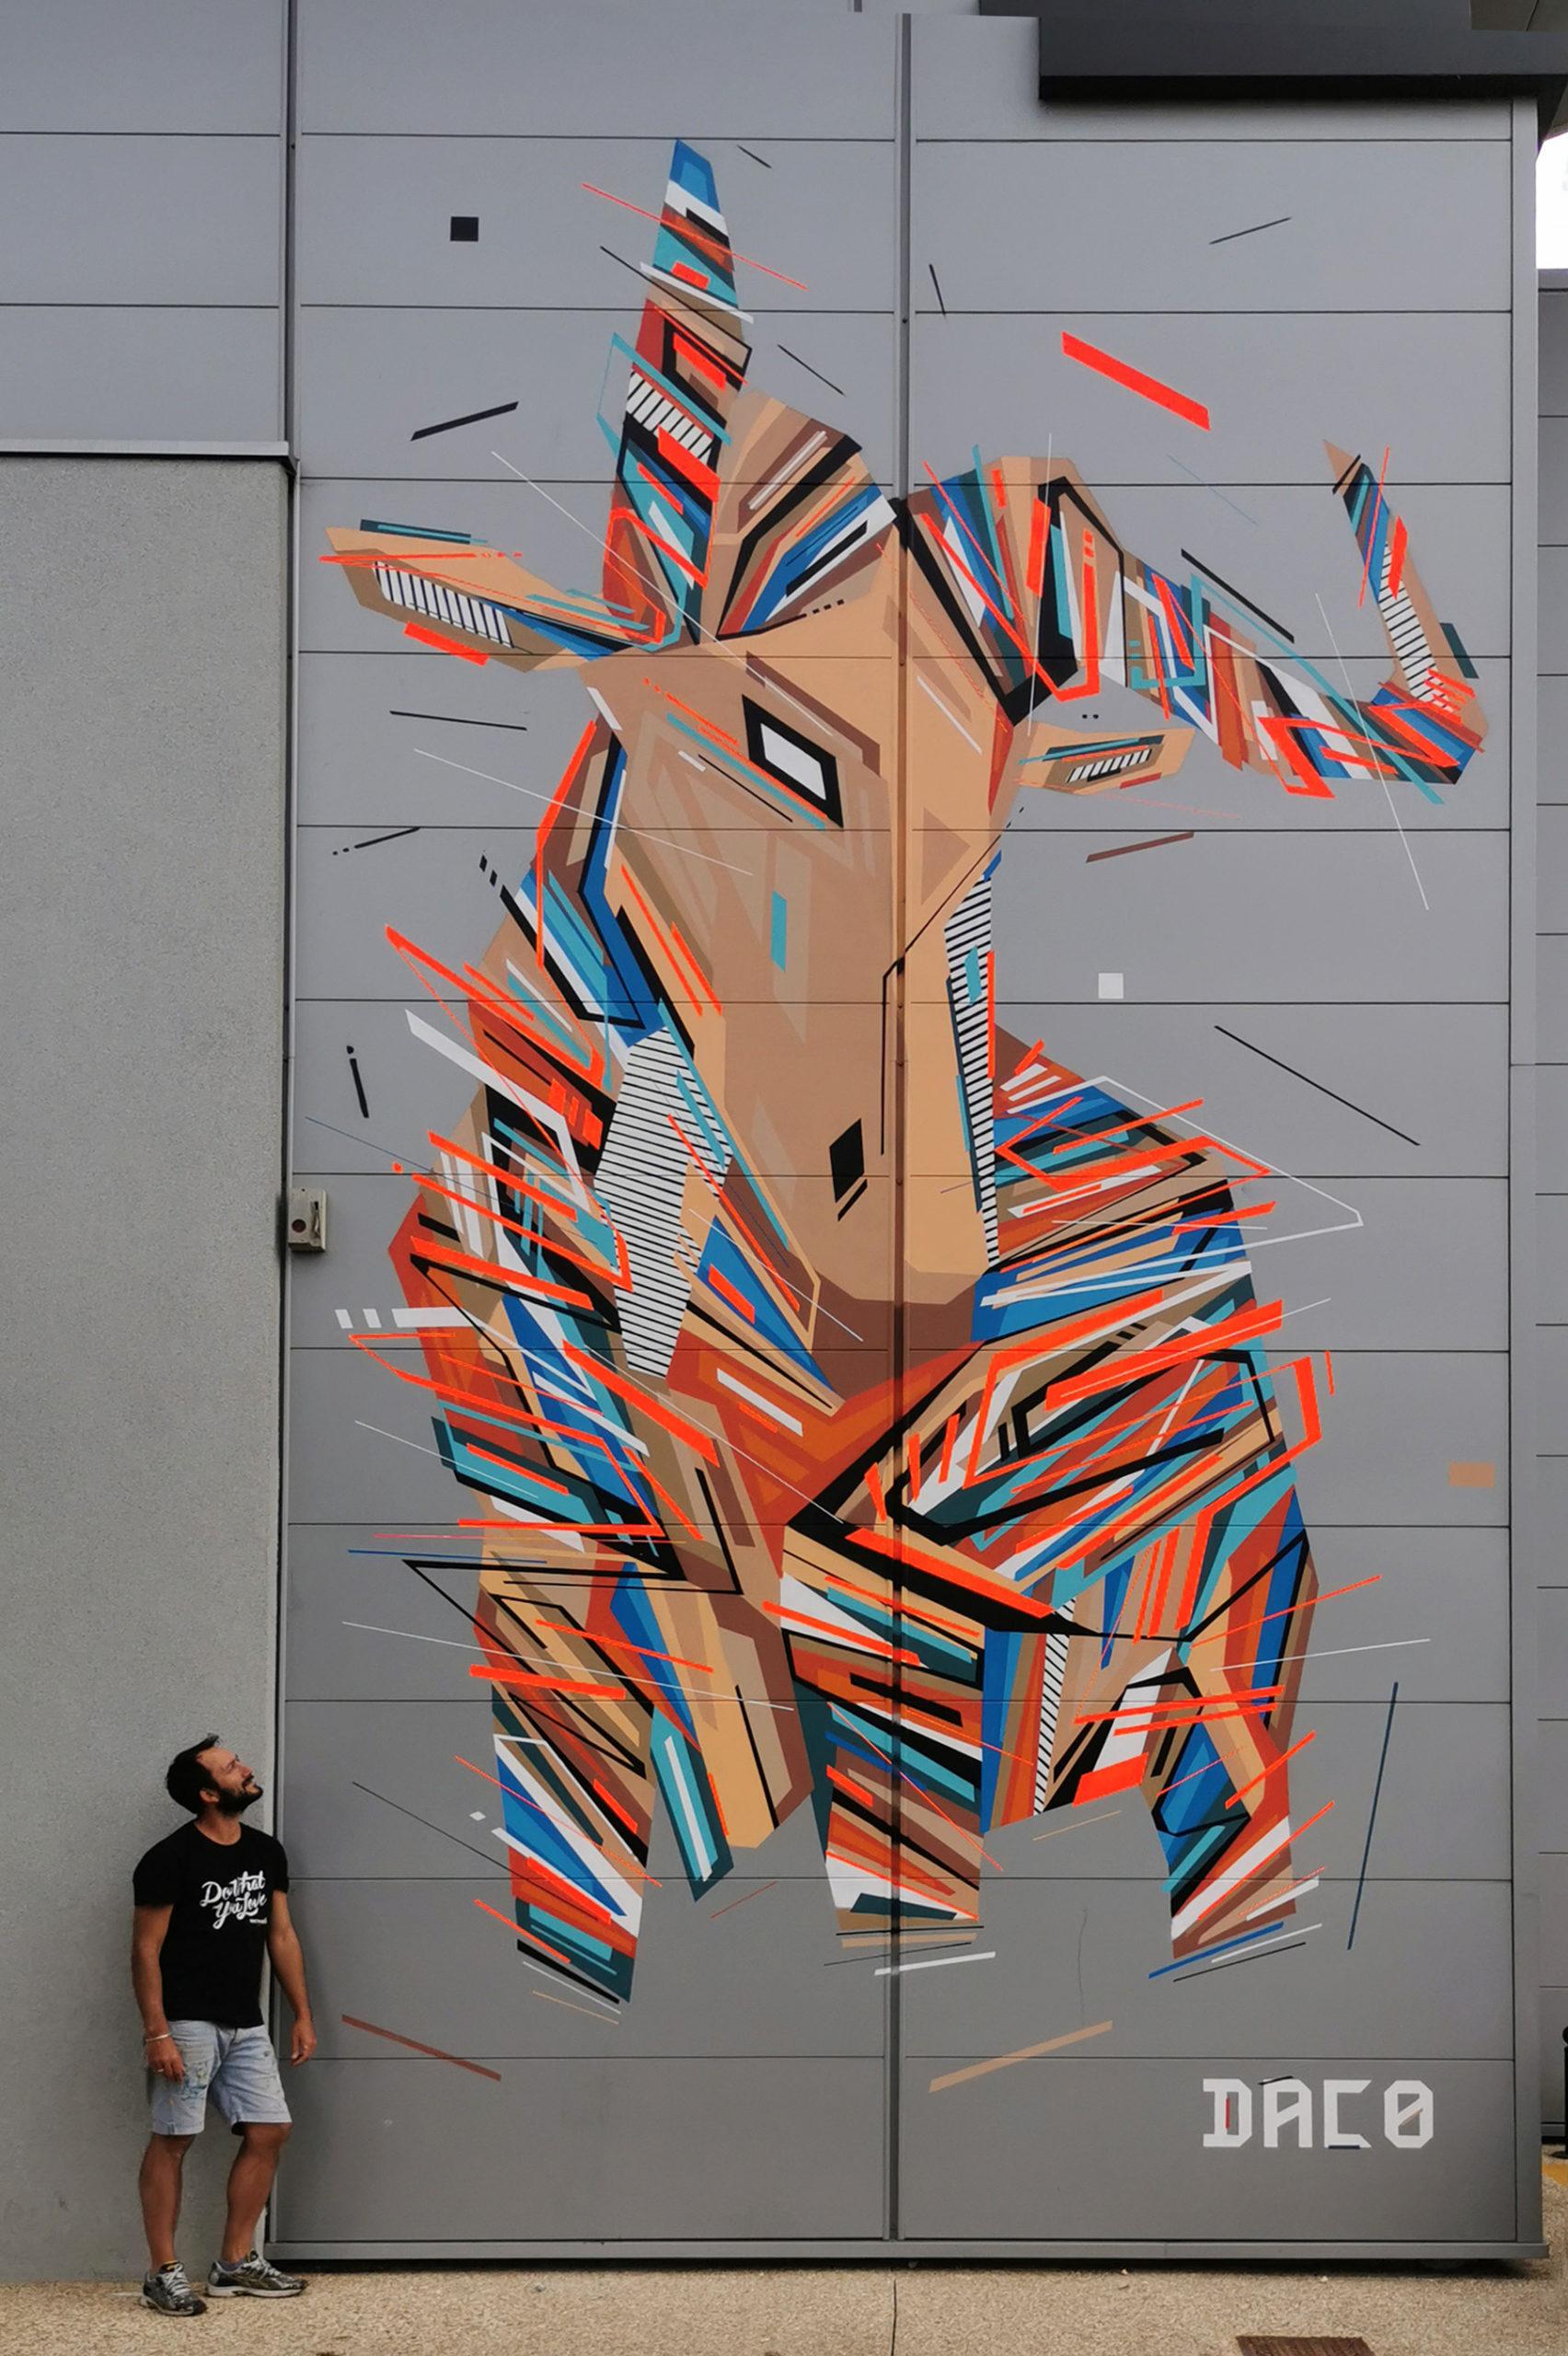 Fresque Graffaune Graffiti gnou réalisée par Daco